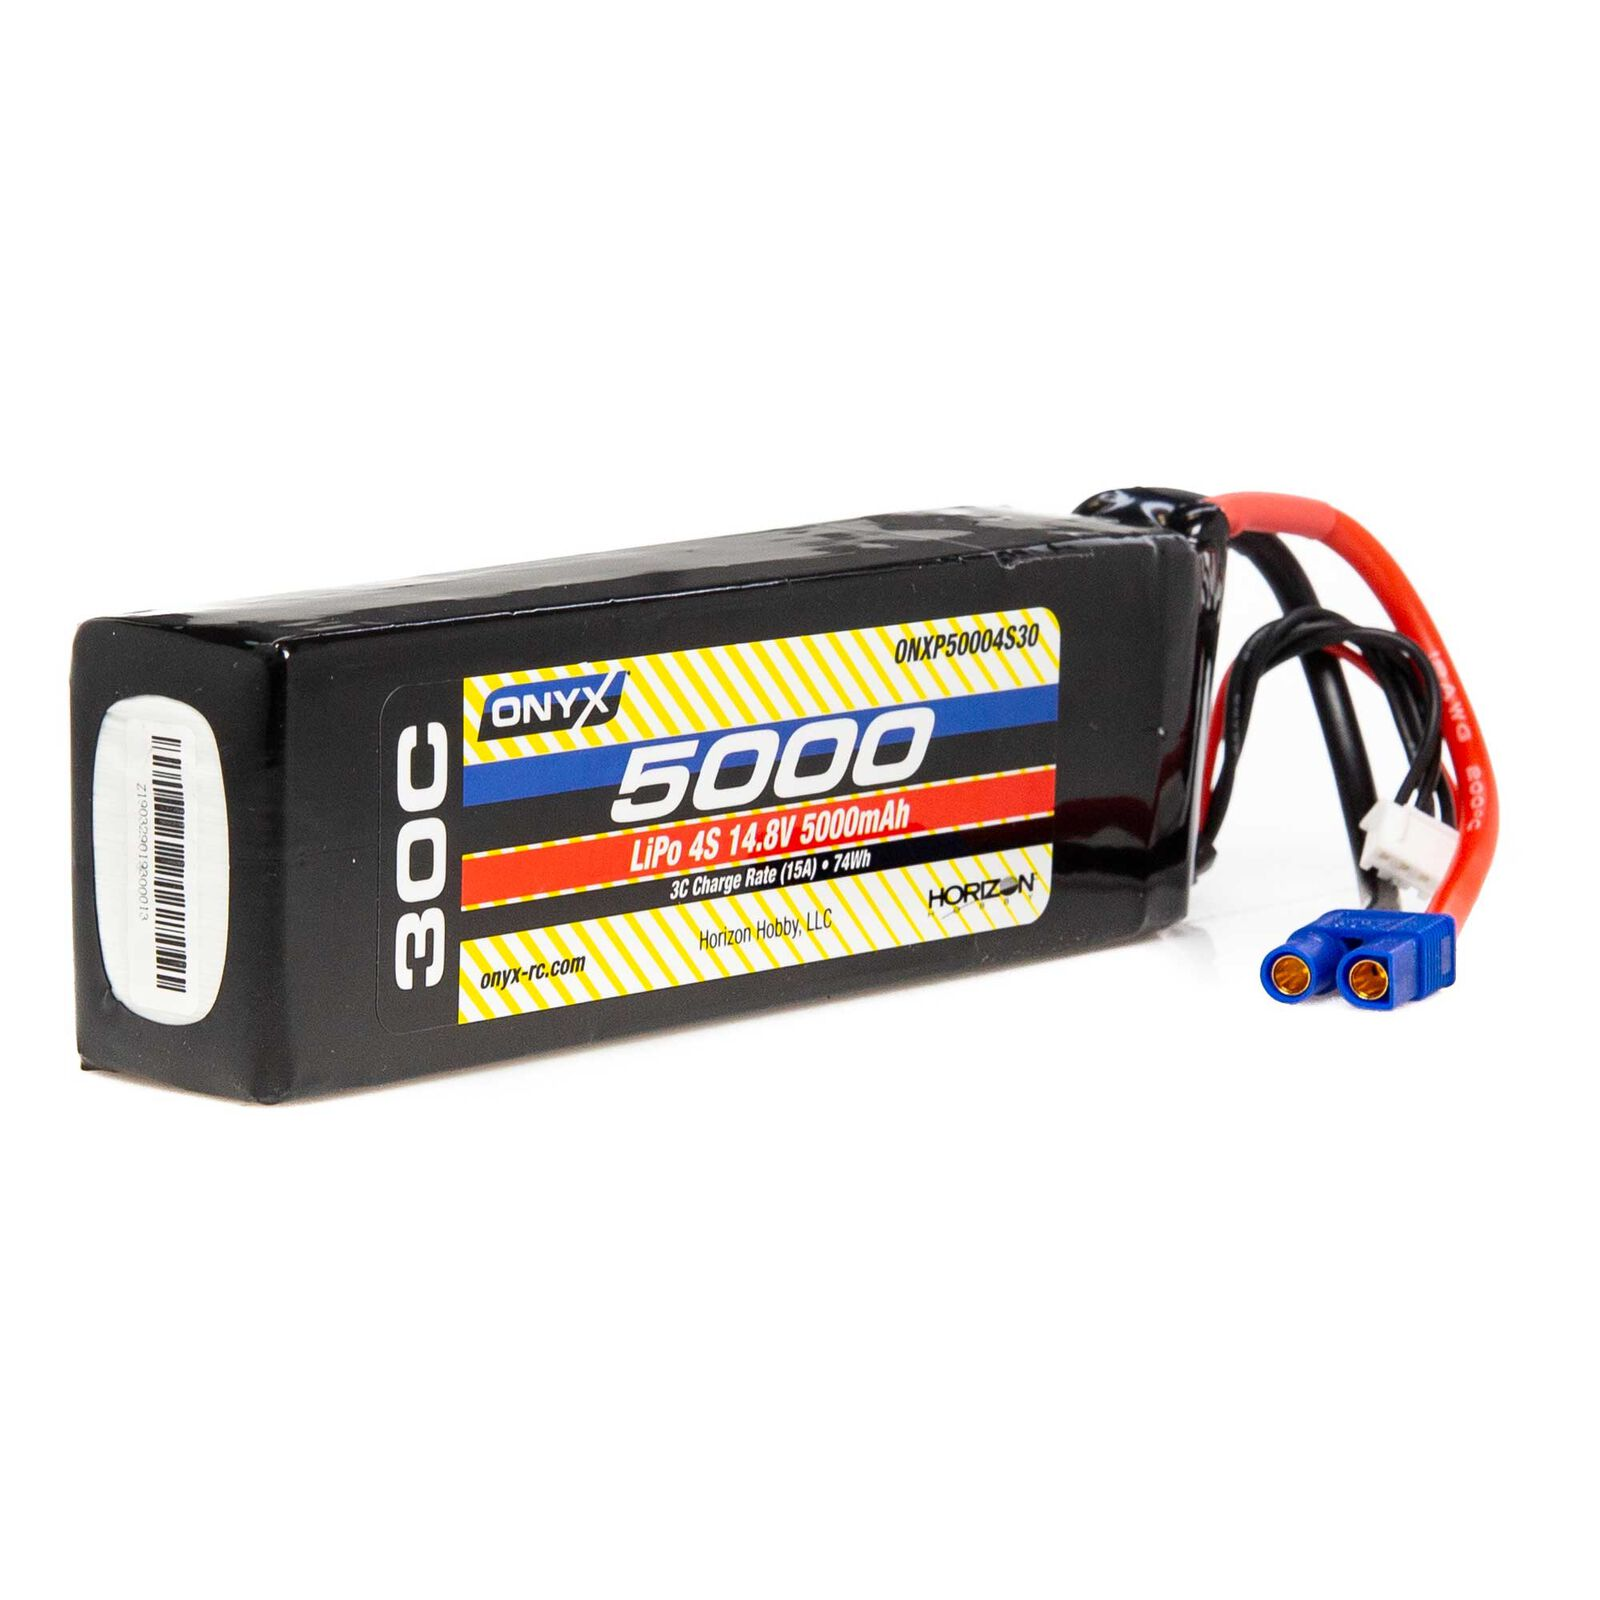 14.8V 5000mAh 4S 30C LiPo Battery: EC3